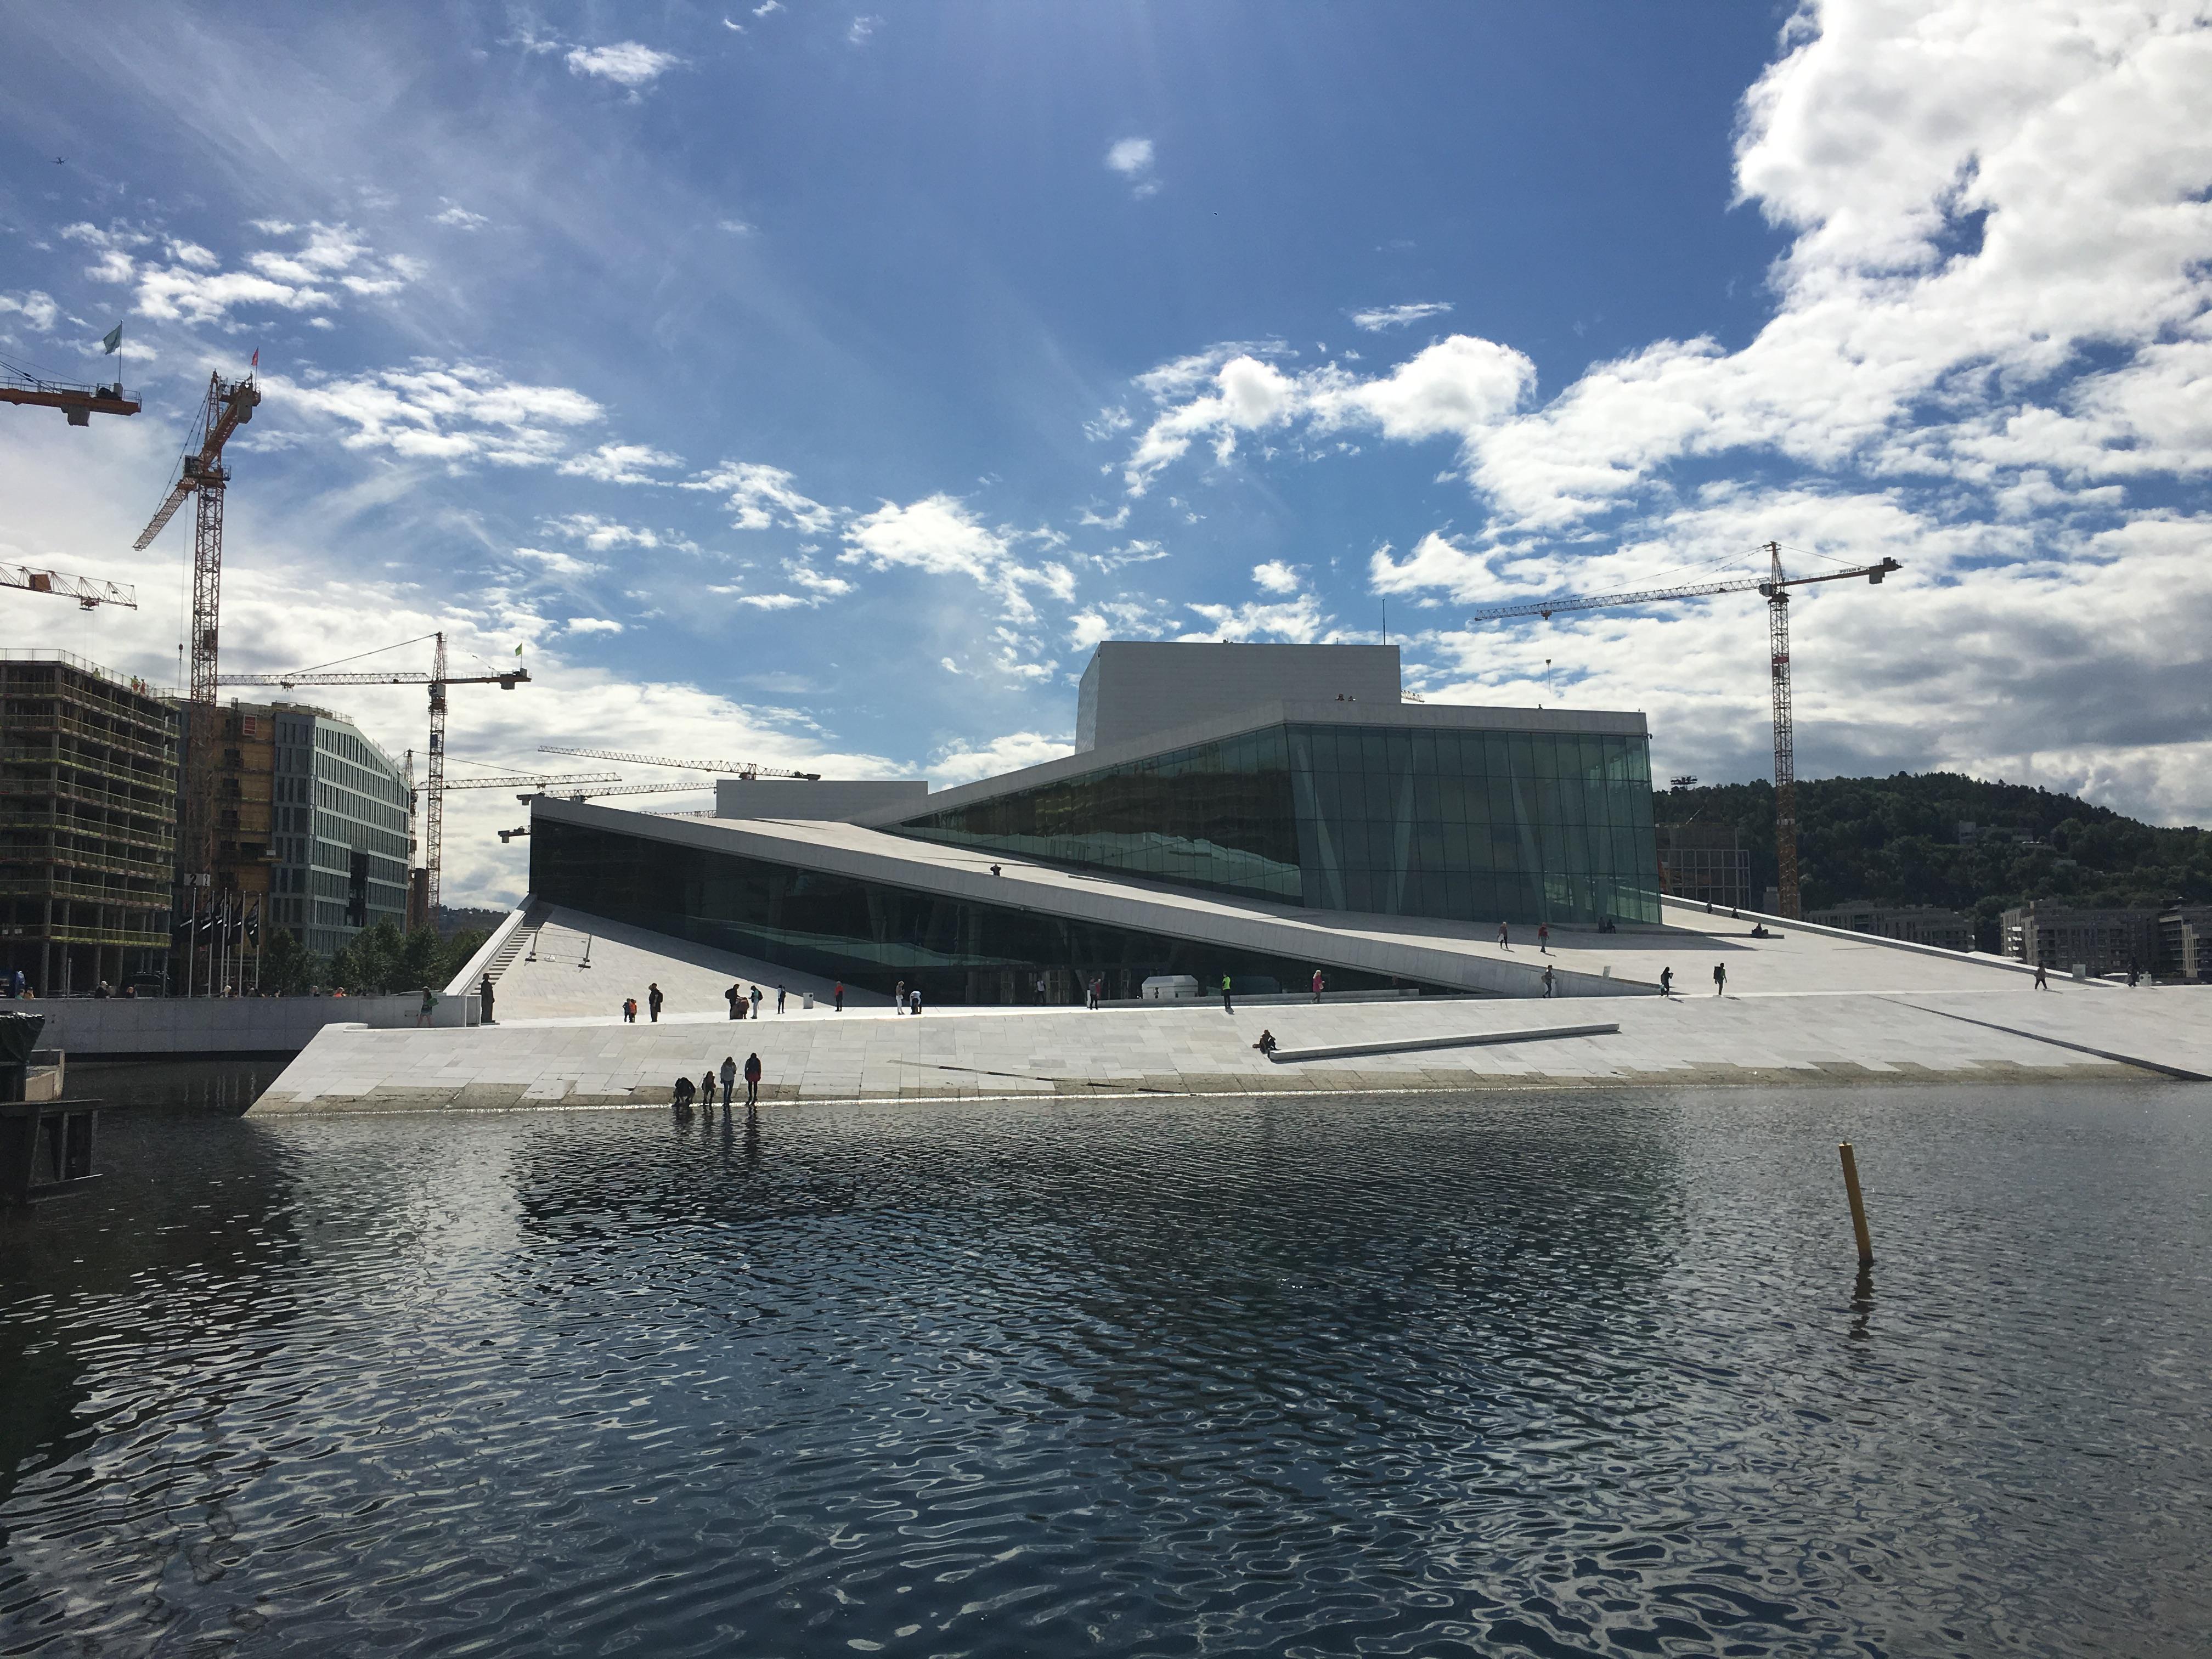 oslo-norway-norweigian-national-opera-ballet